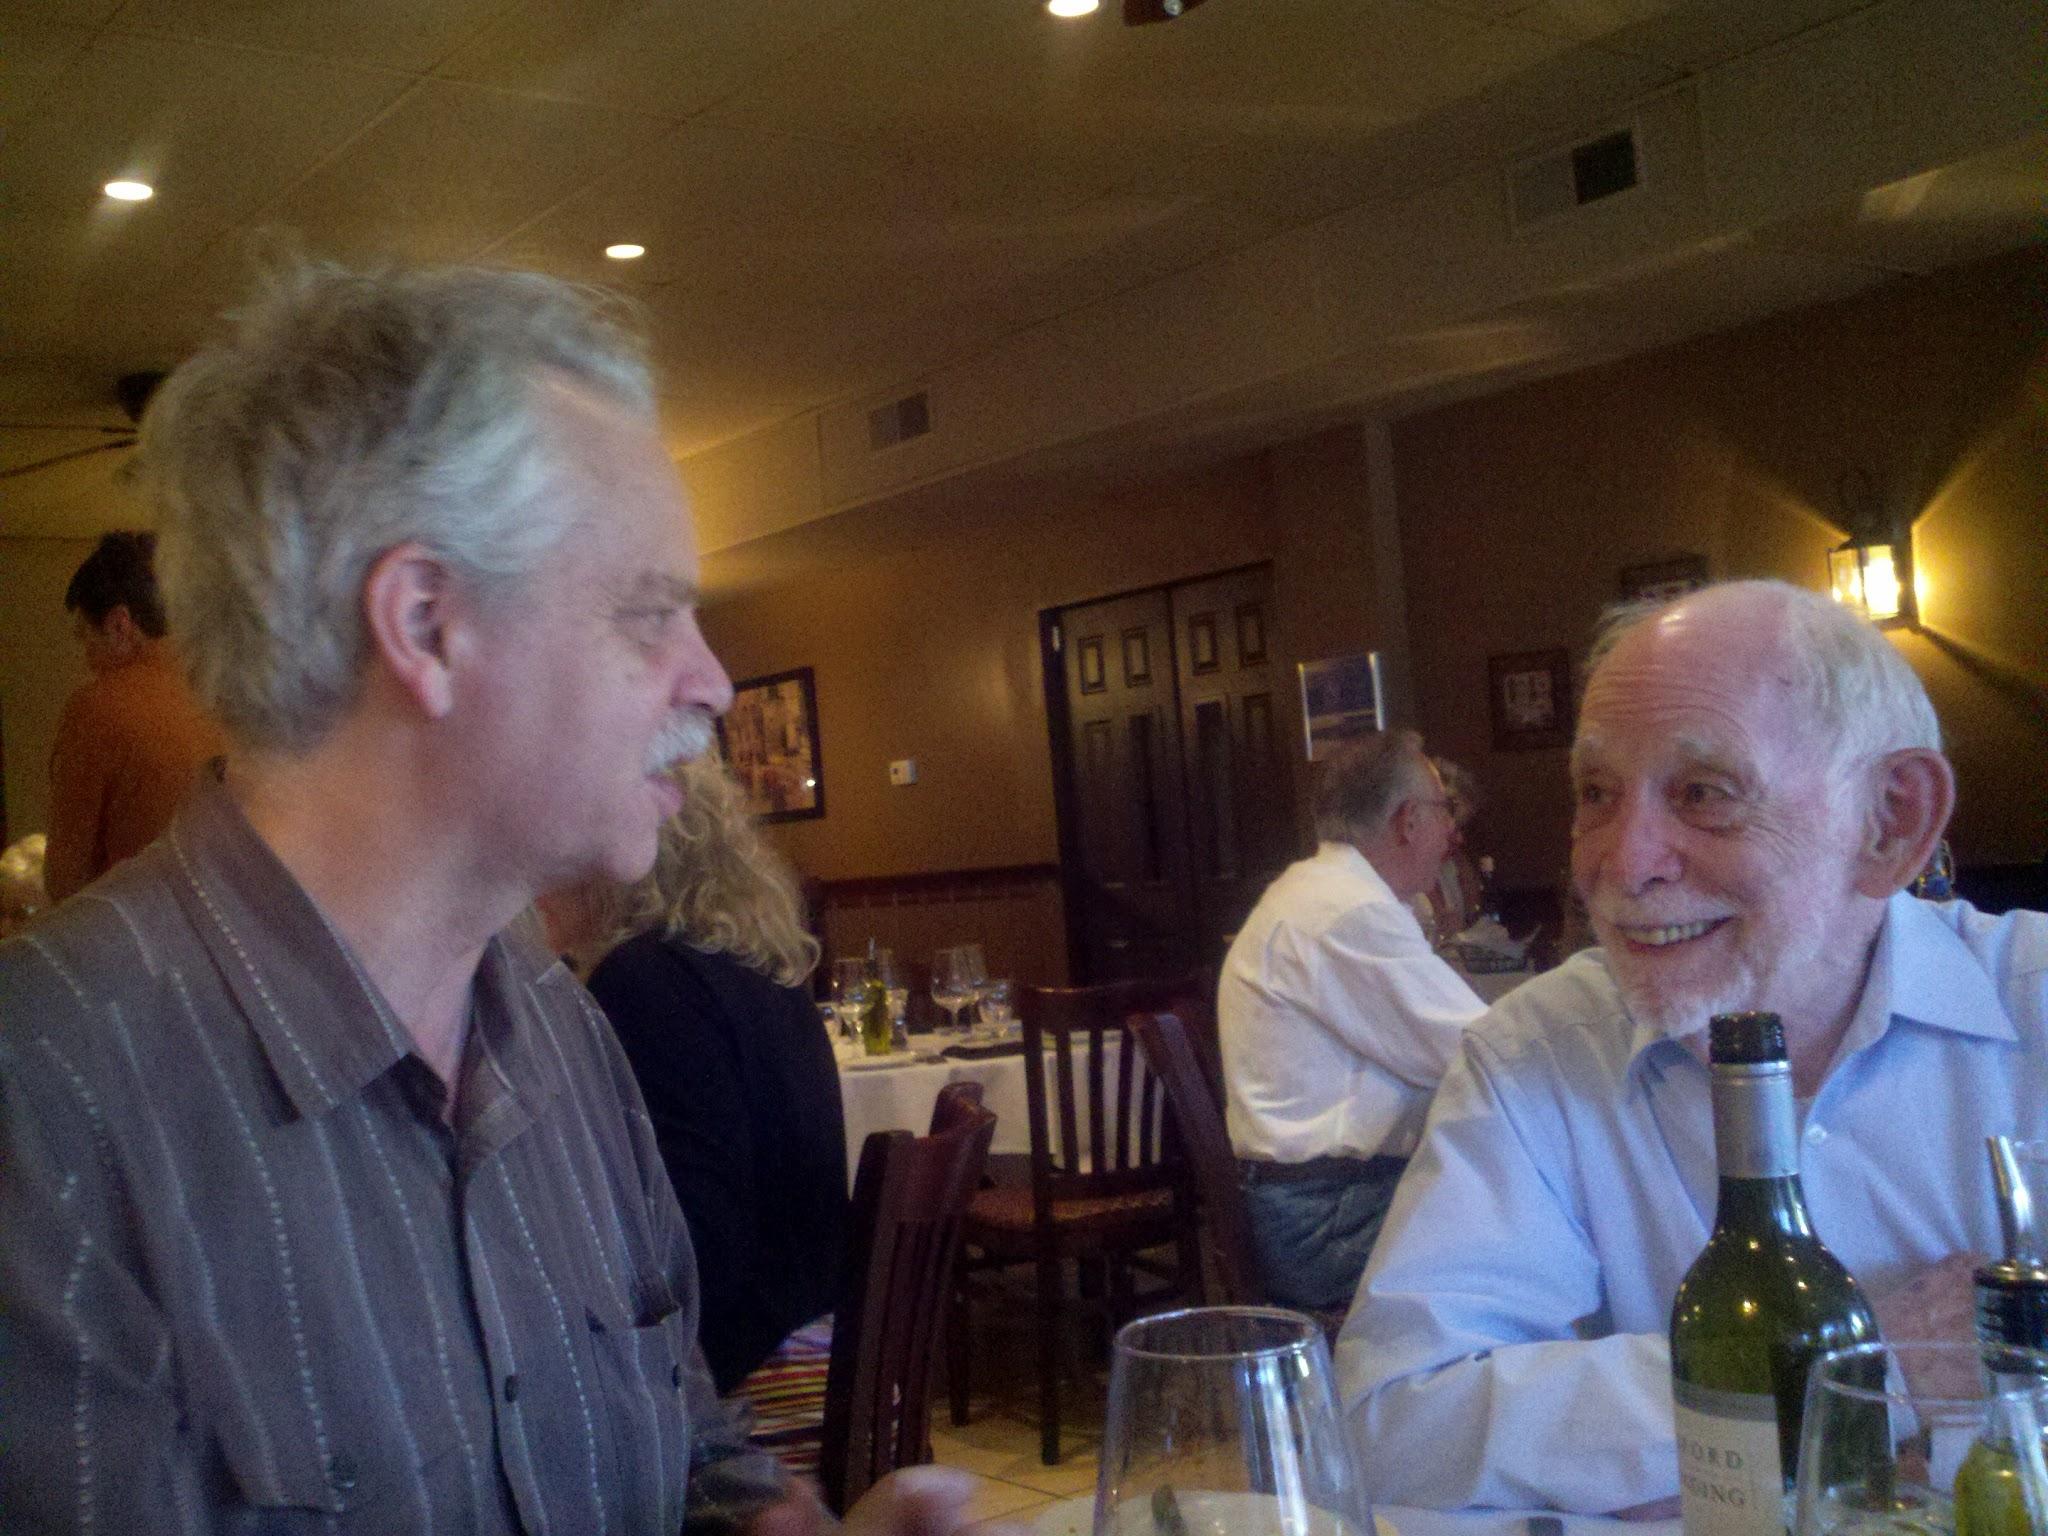 Uncle john and carlo